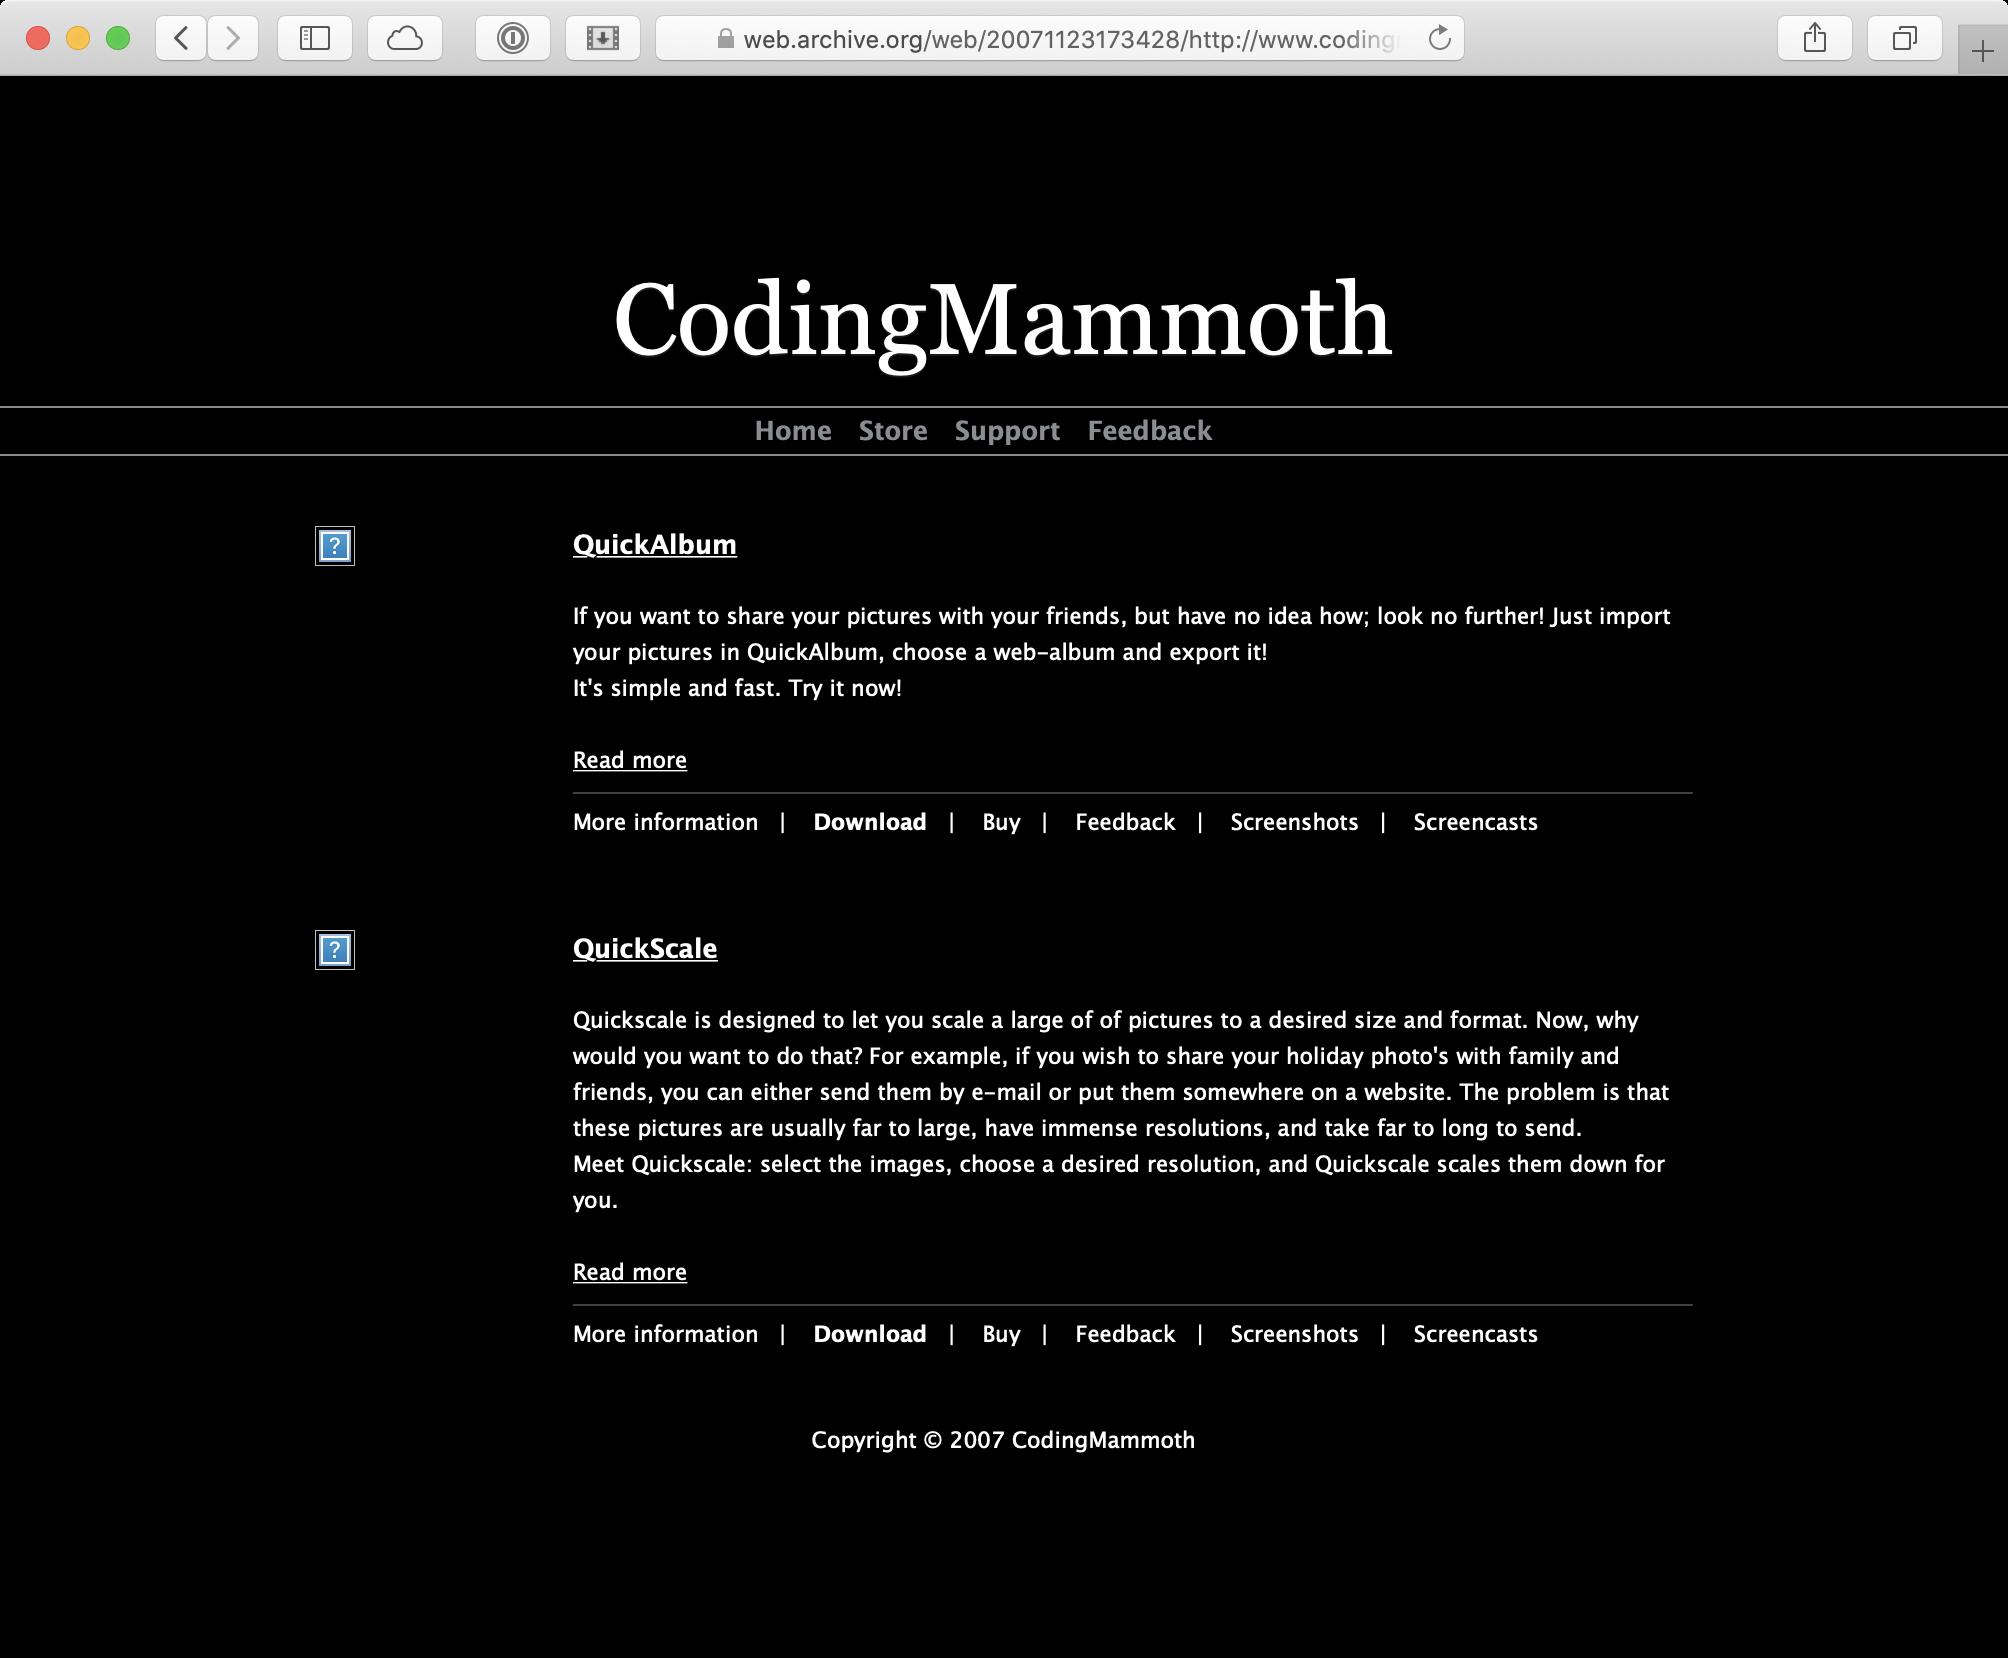 Website Coding Mammoth 2007